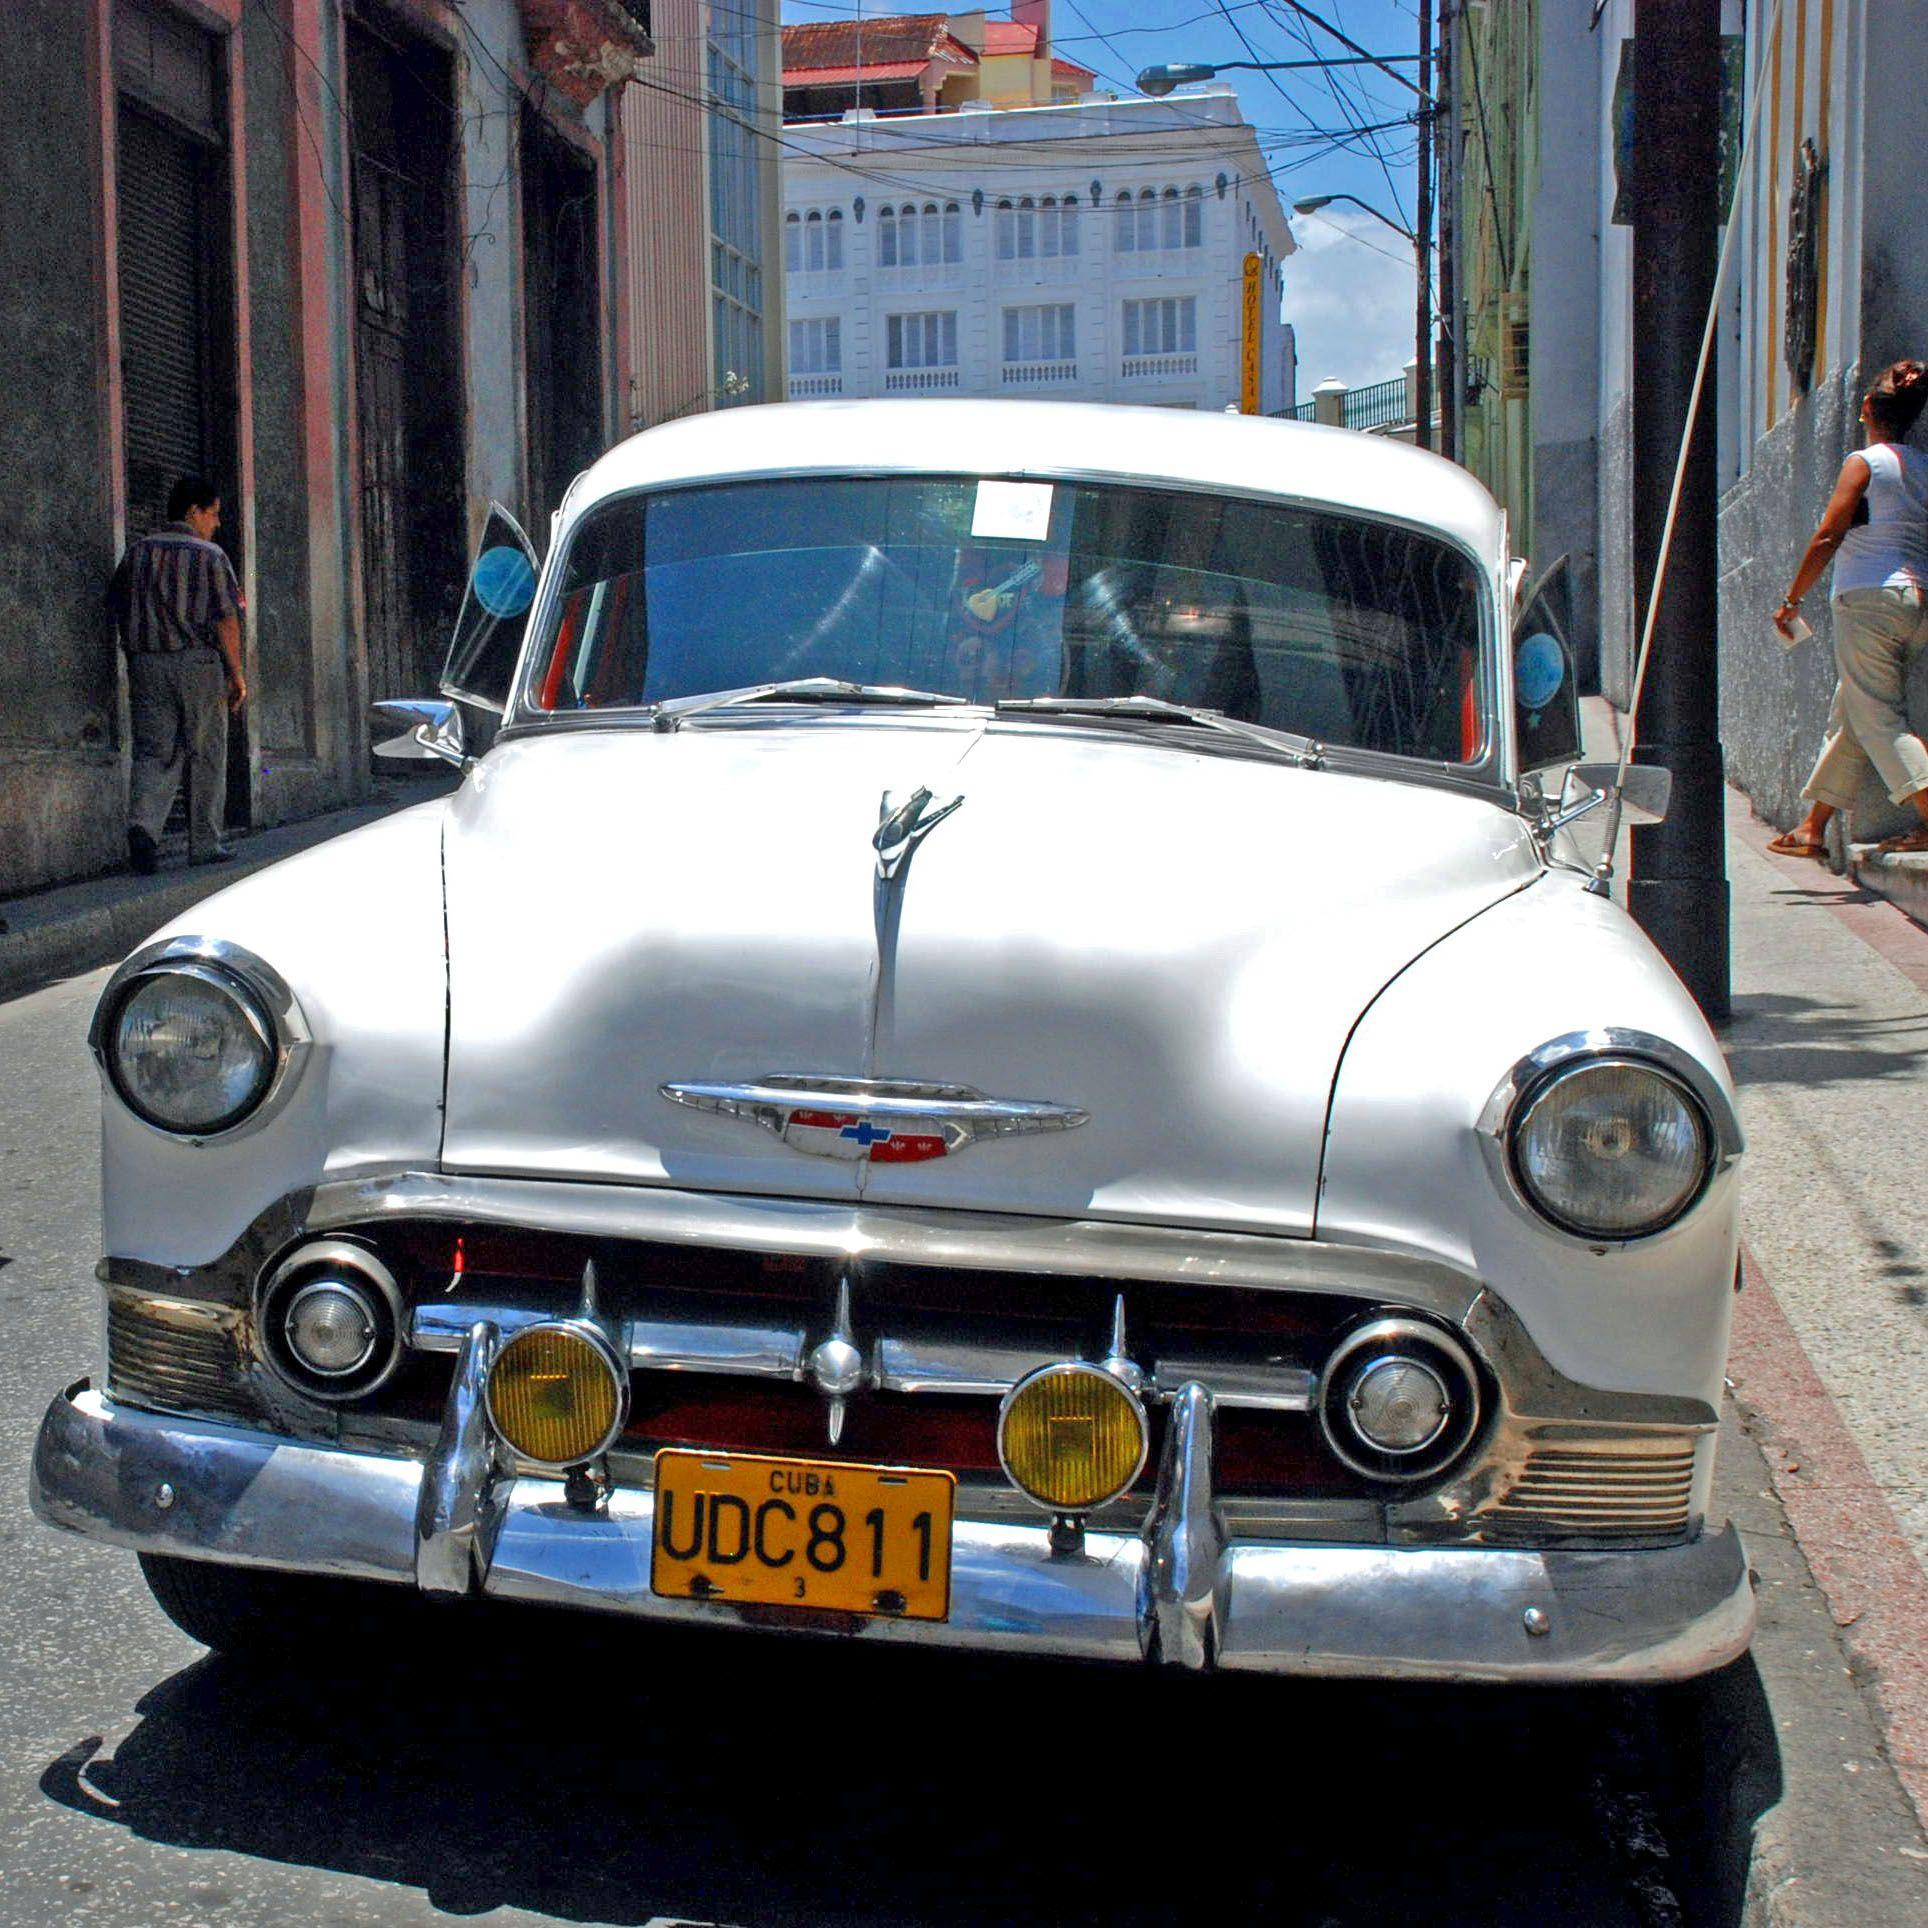 Provincia de Pinar del Río, República de Cuba